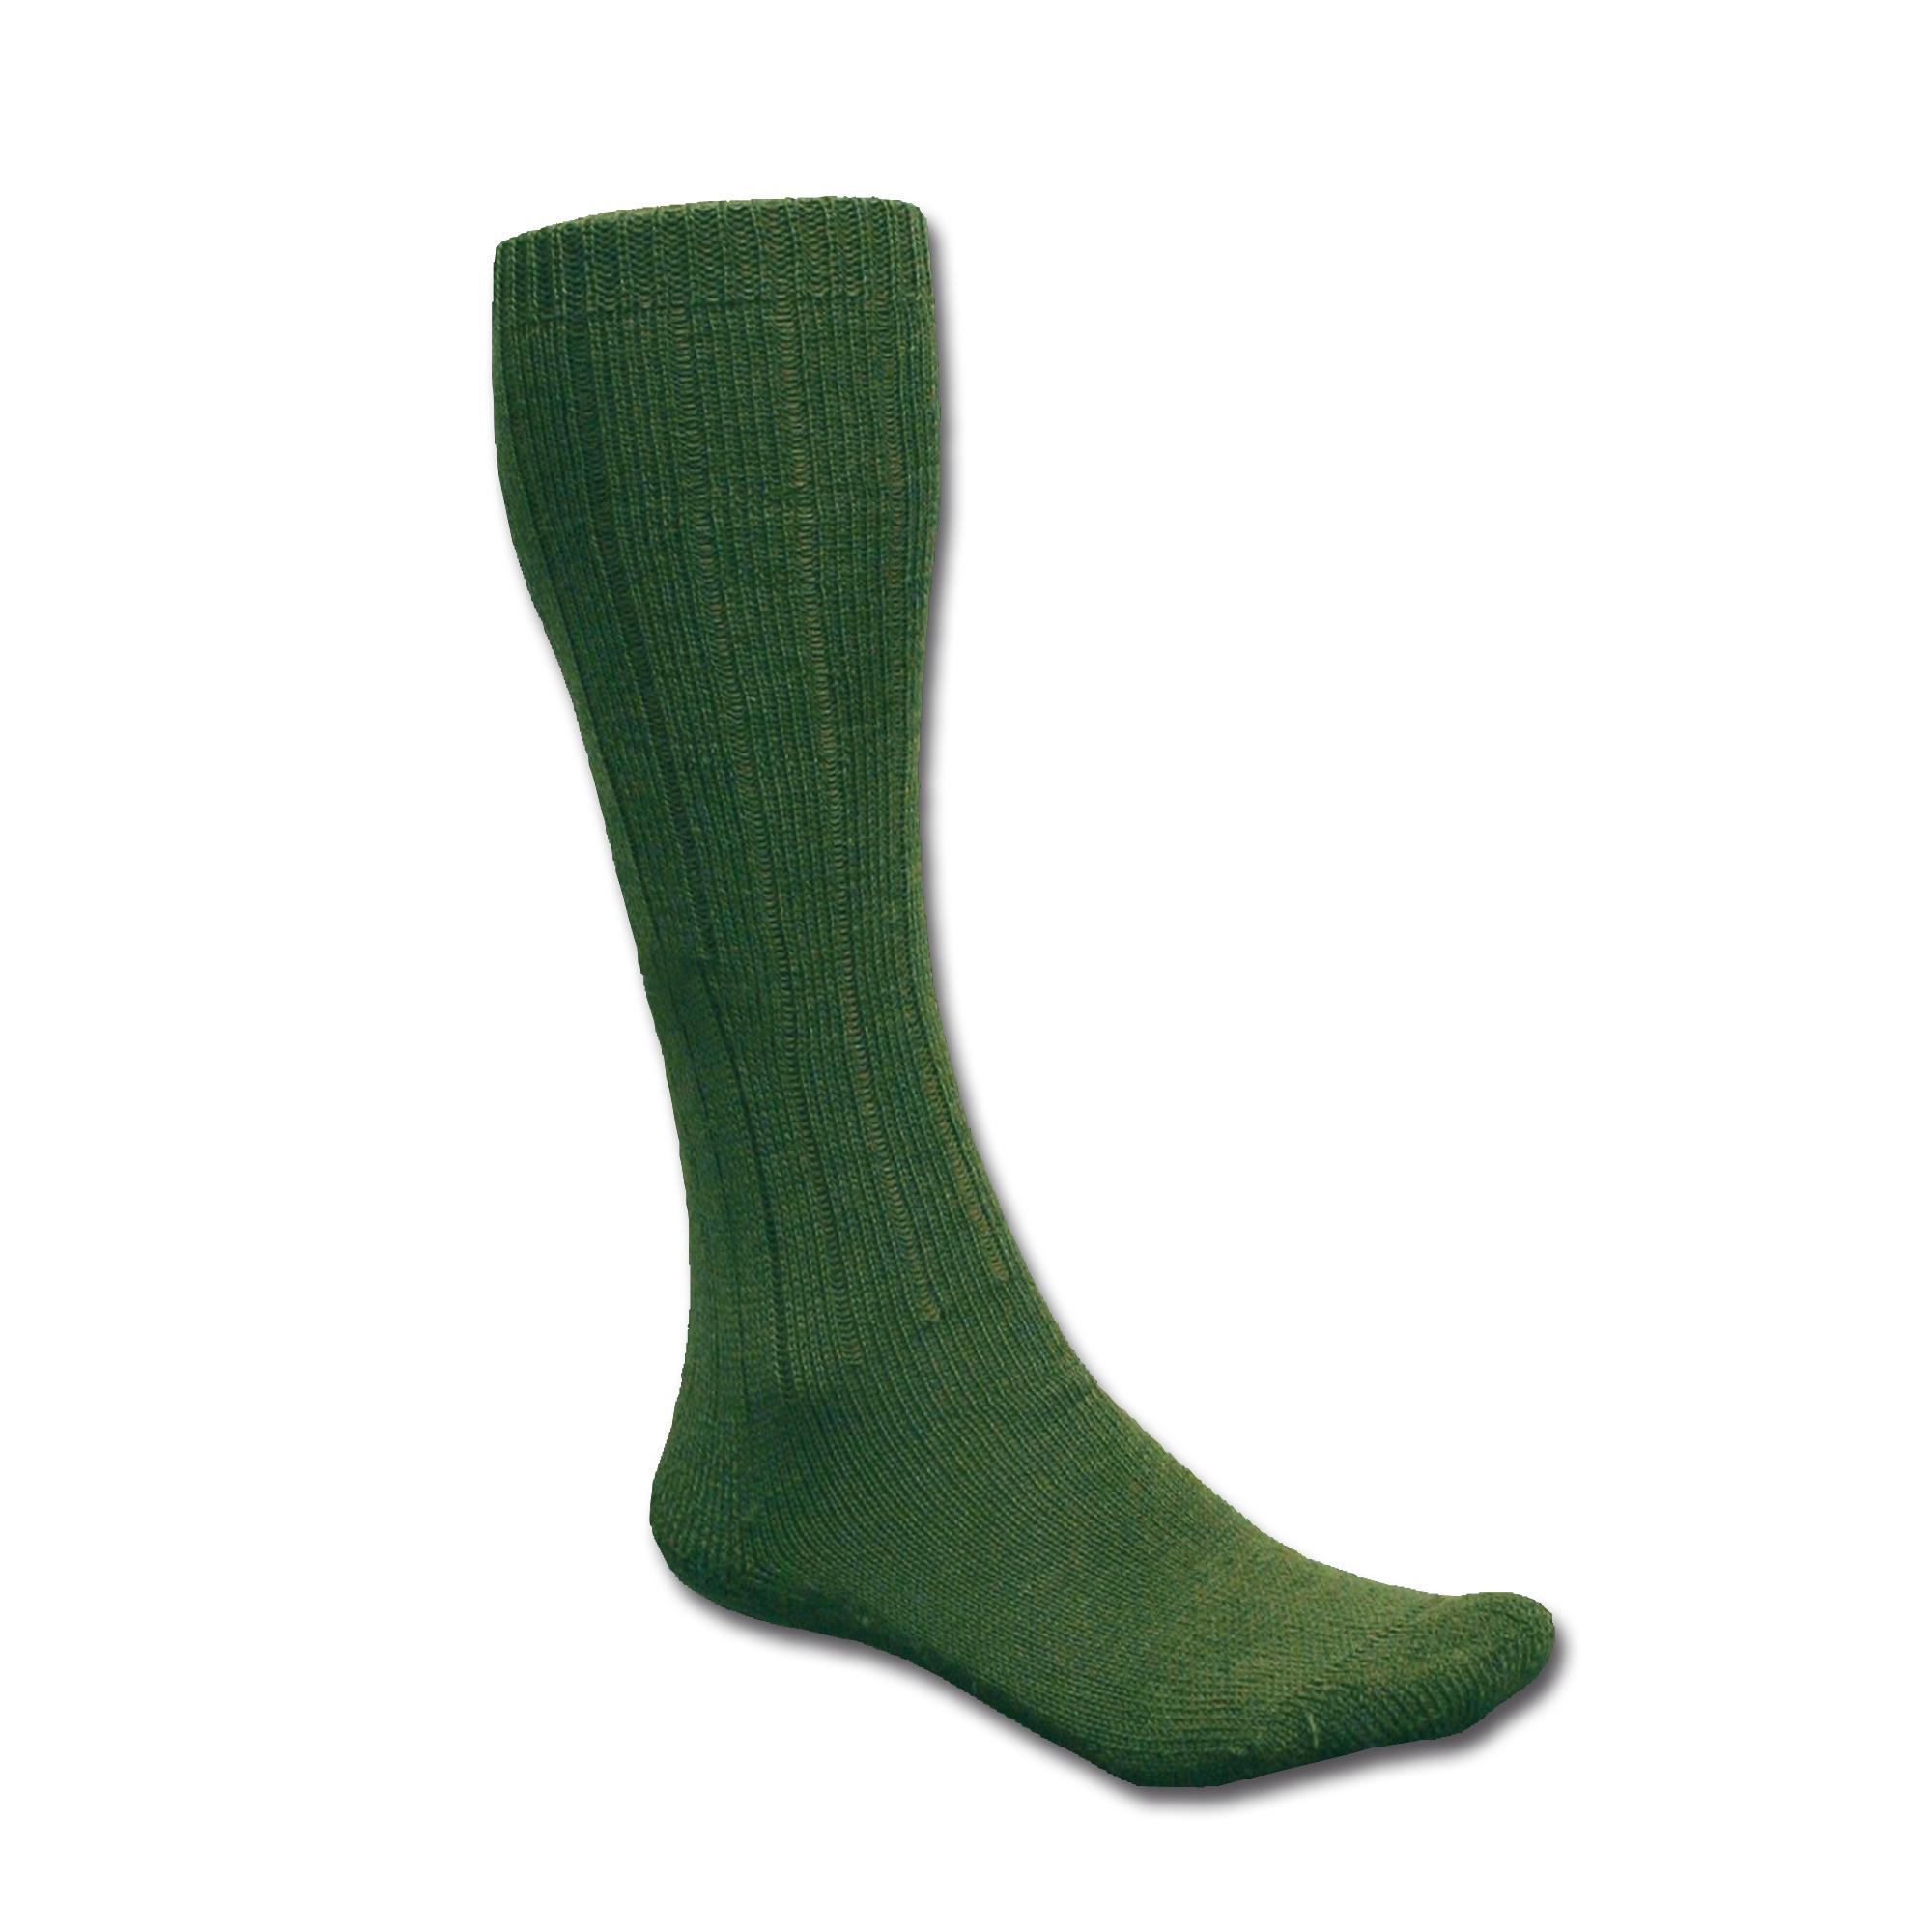 German Army Socks olive